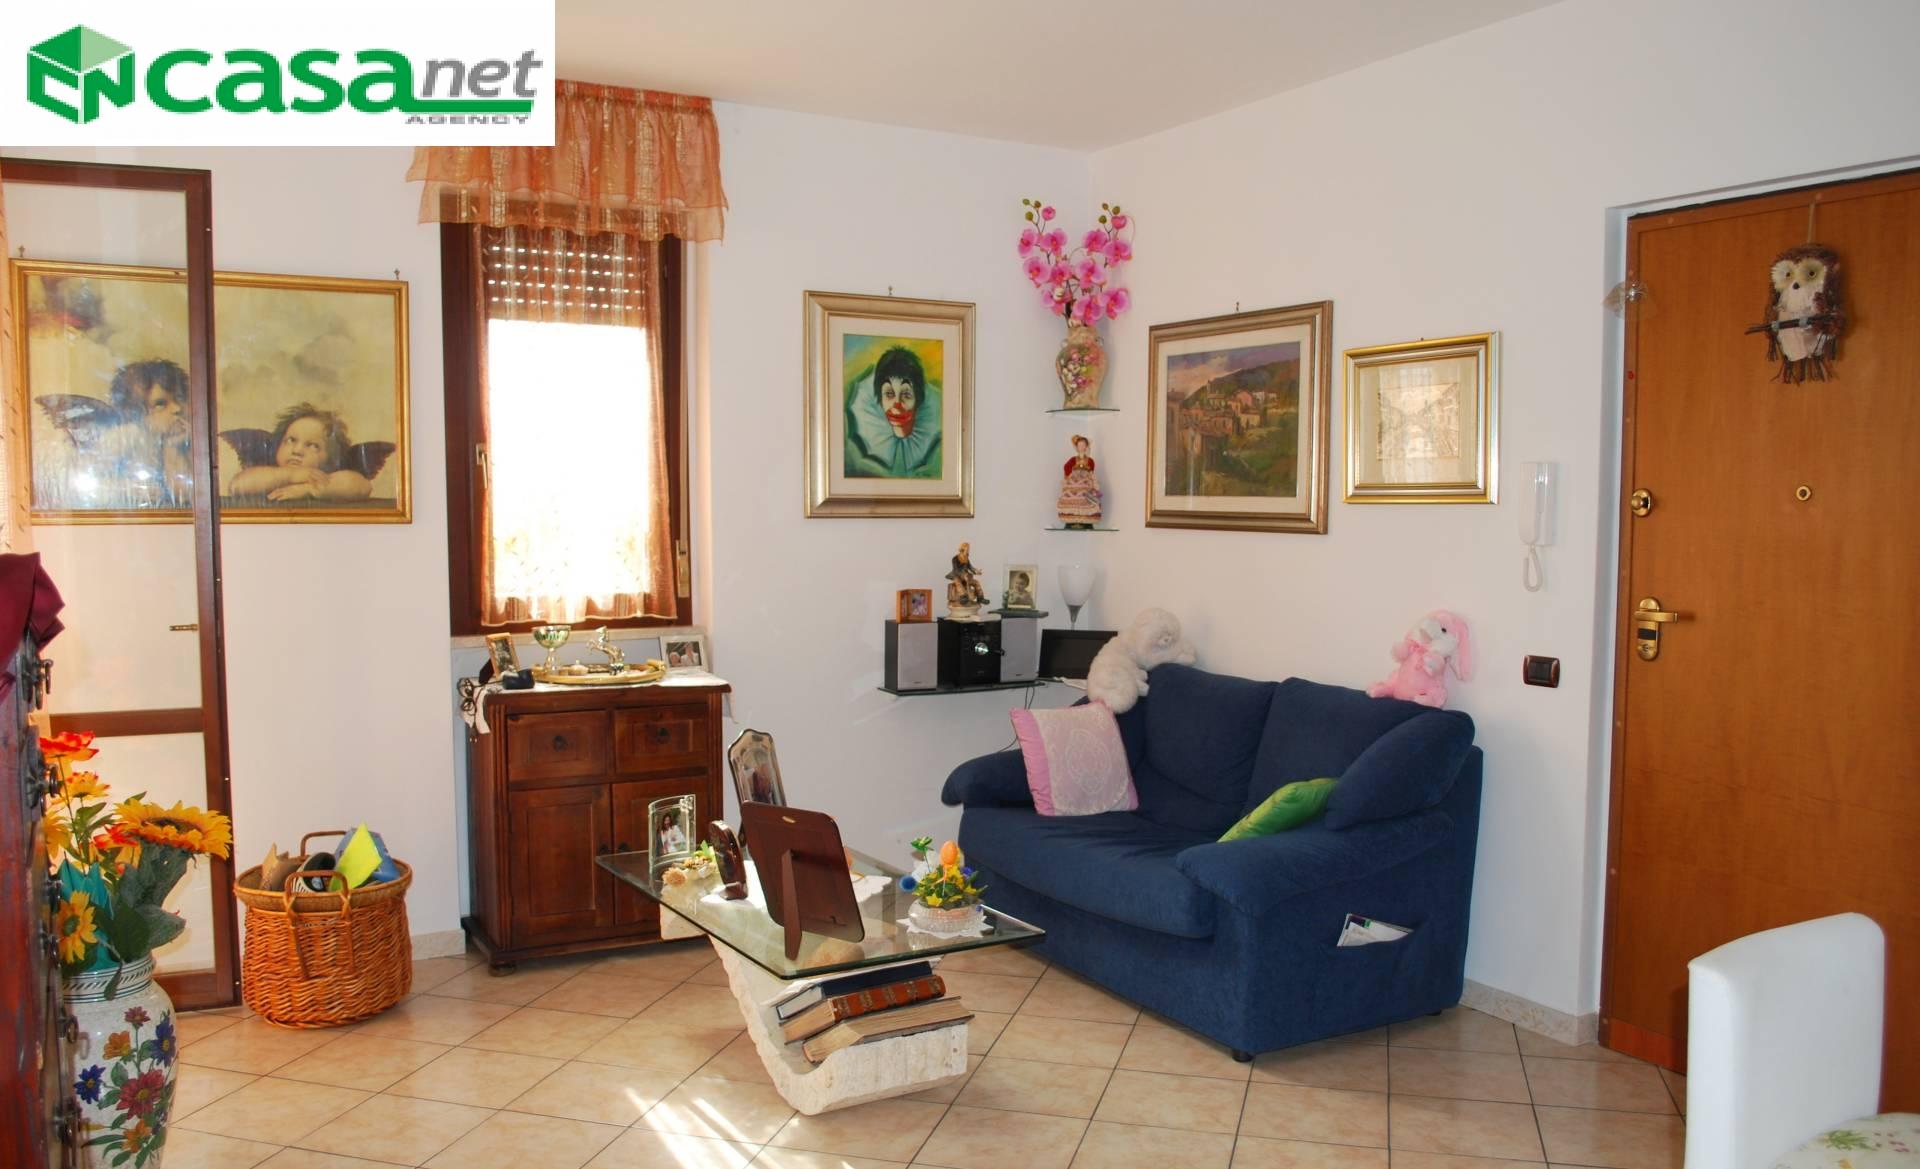 Bilocale Guidonia Montecelio Via Palombarese 2